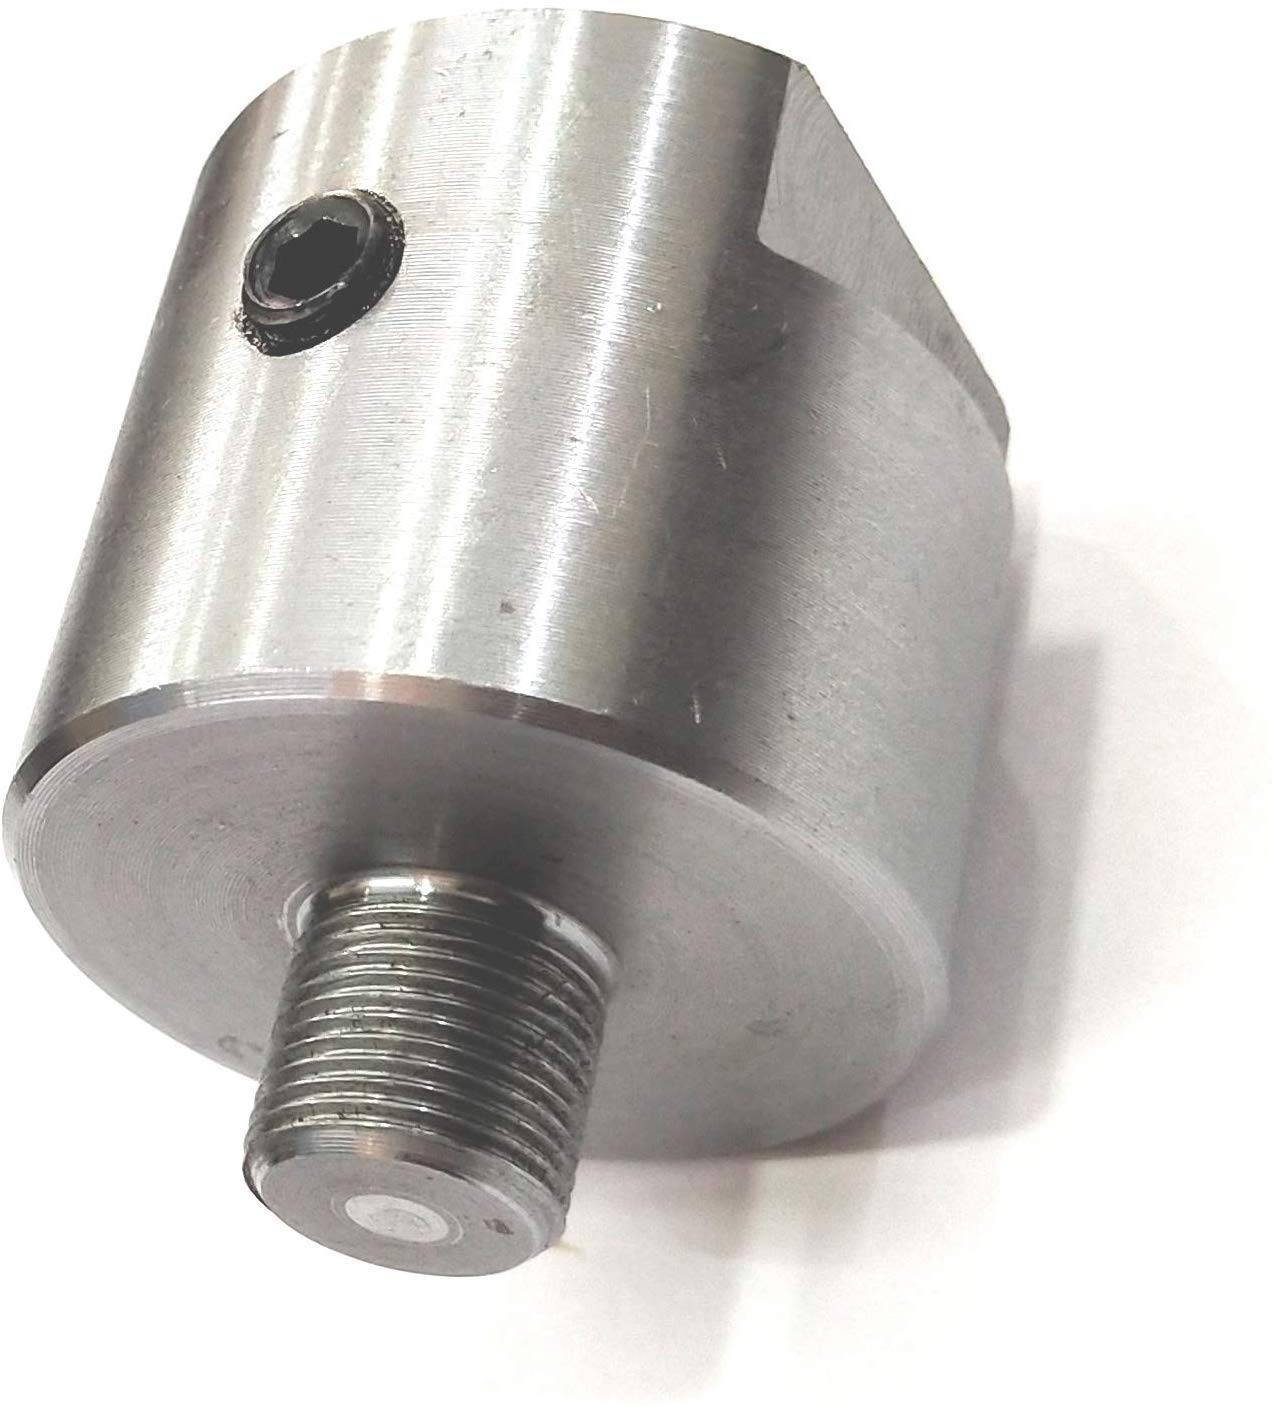 Adaptador de eje de torno de calidad preciosa que conecta eje de m/áquina de 1 pulgada x 8 TPI a mandriles roscados M14 x 1